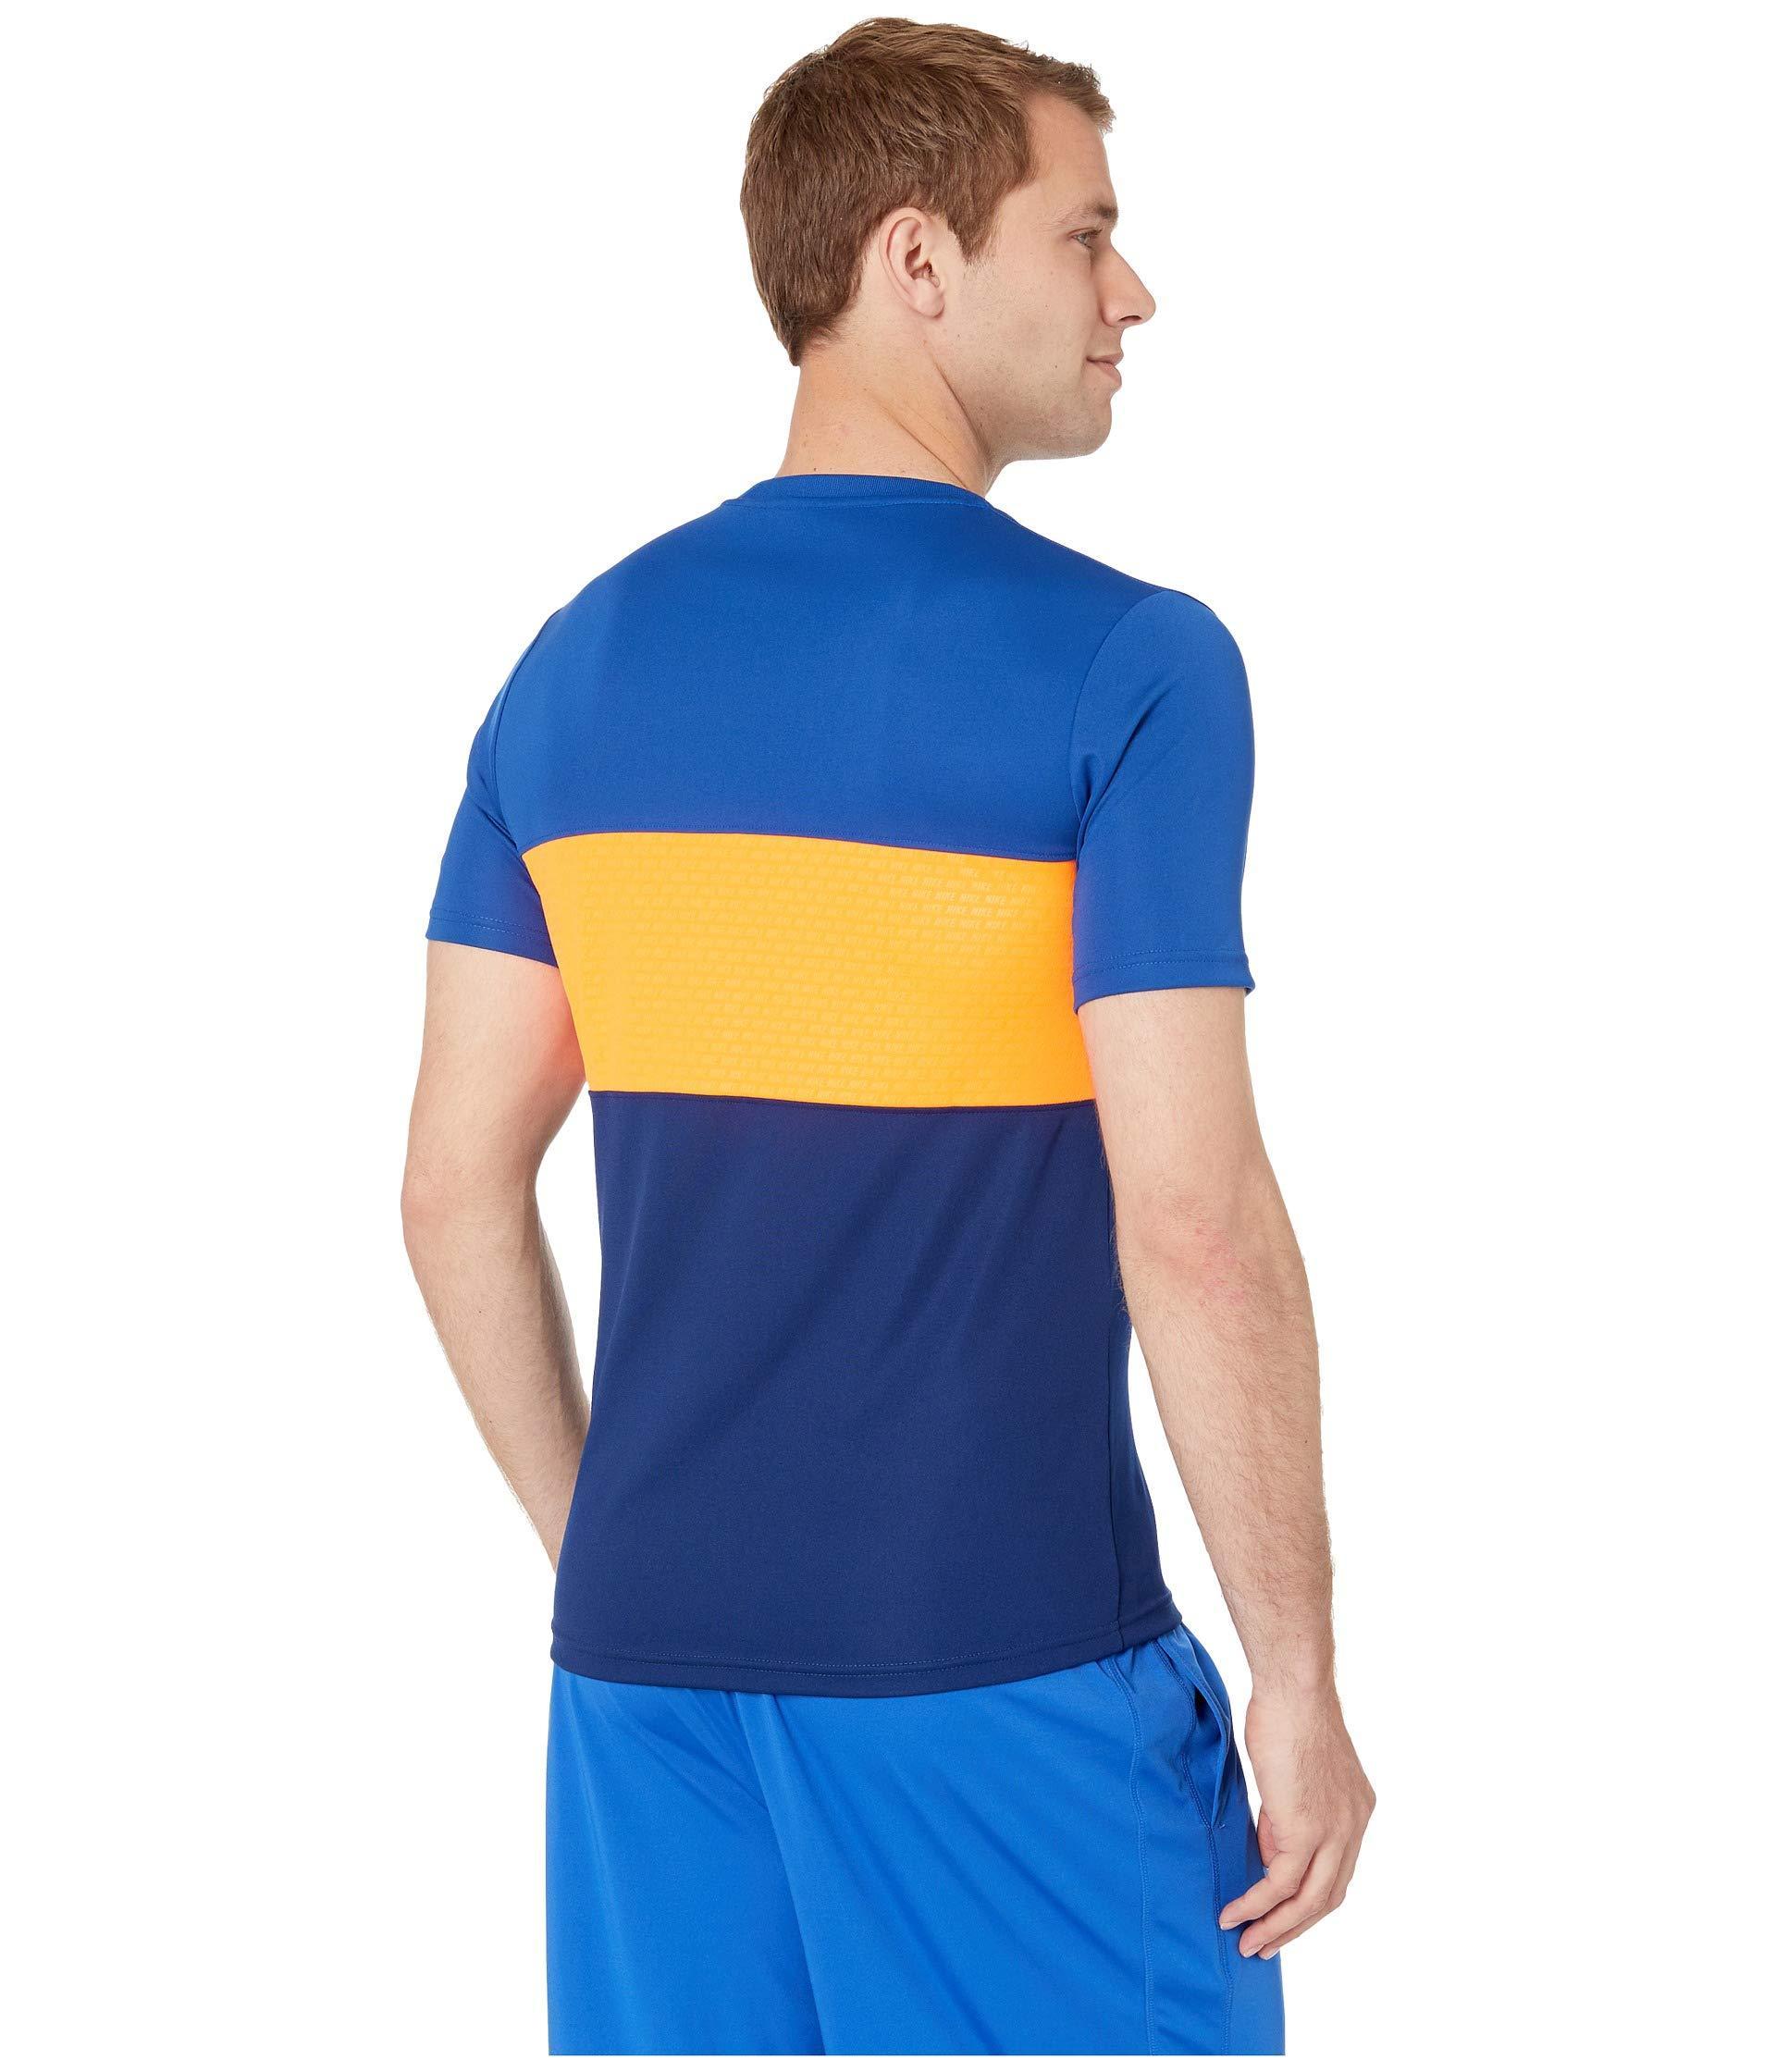 Dry Academy Top Short Sleeve Graphics (indigo Forceblue Voidtotal Orange) Men's Clothing